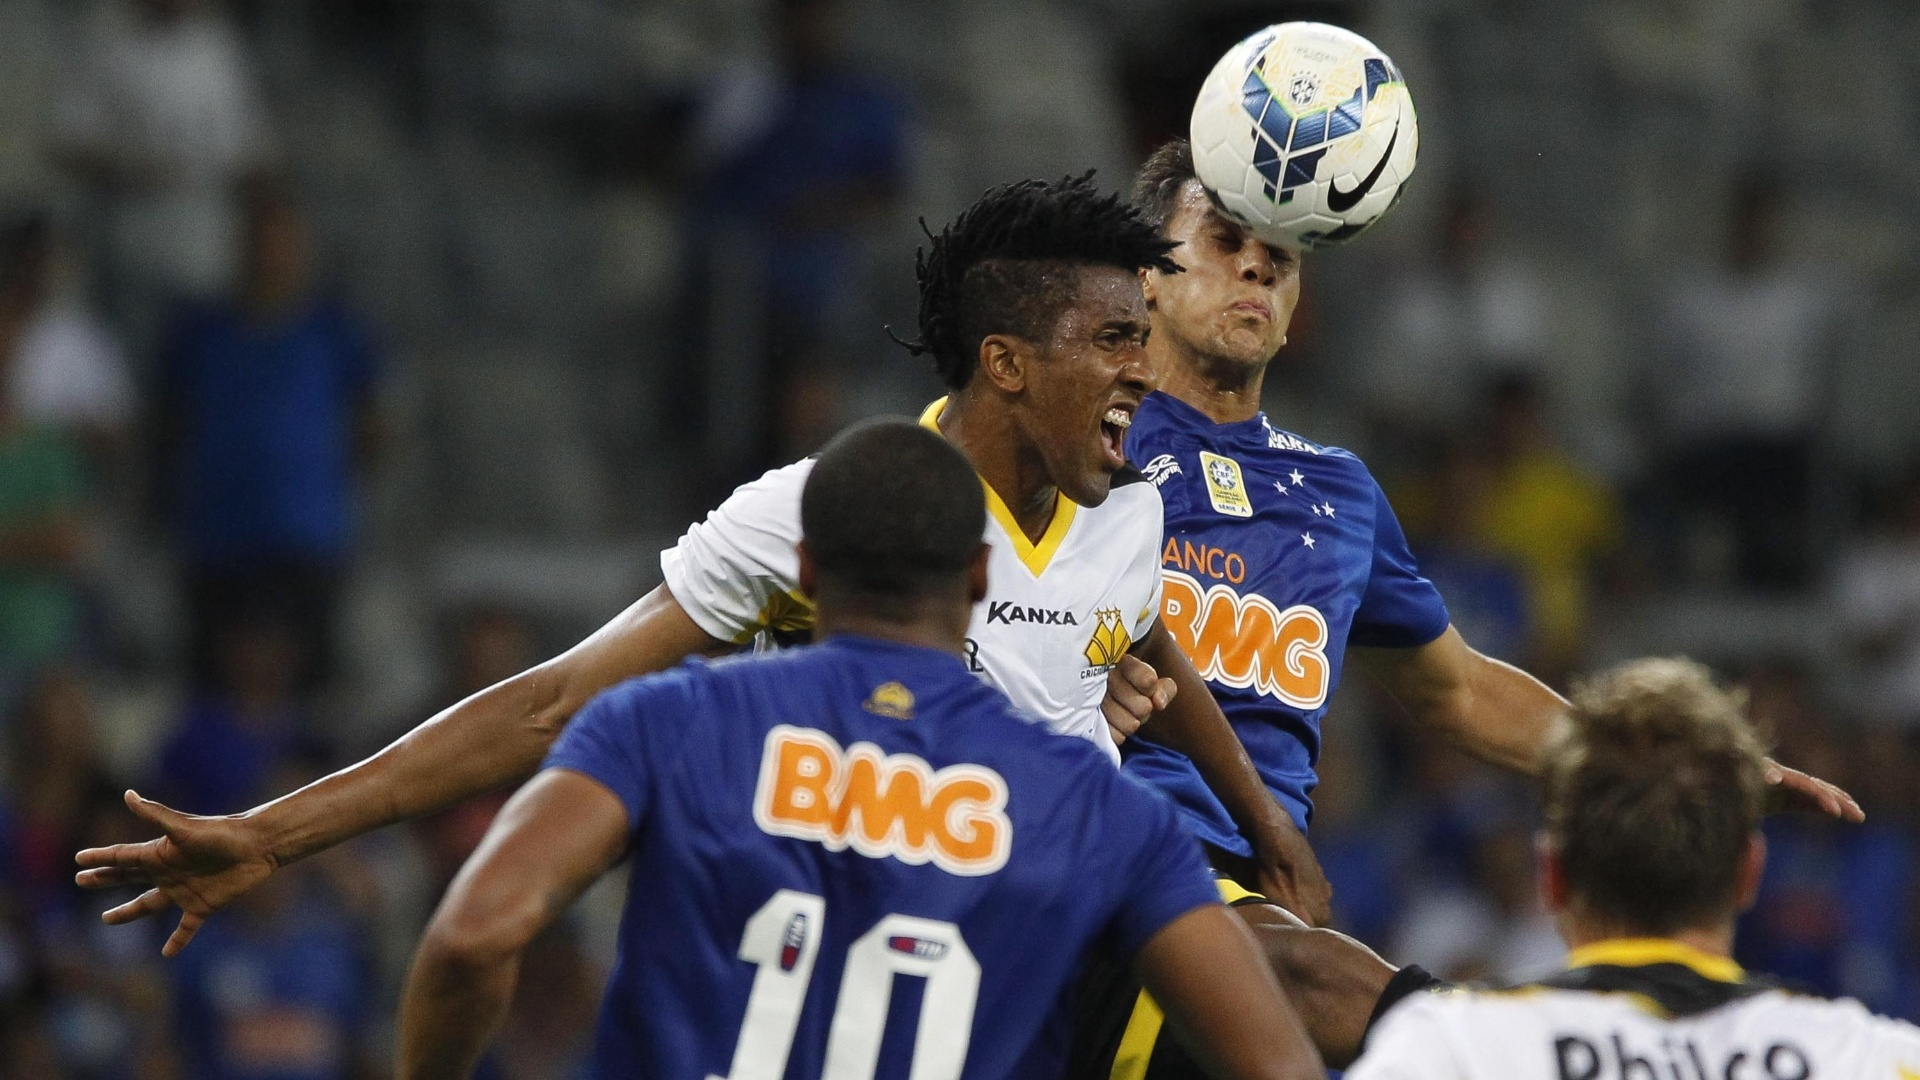 Cortez ganha bola pelo alto para o Criciúma contra o Cruzeiro